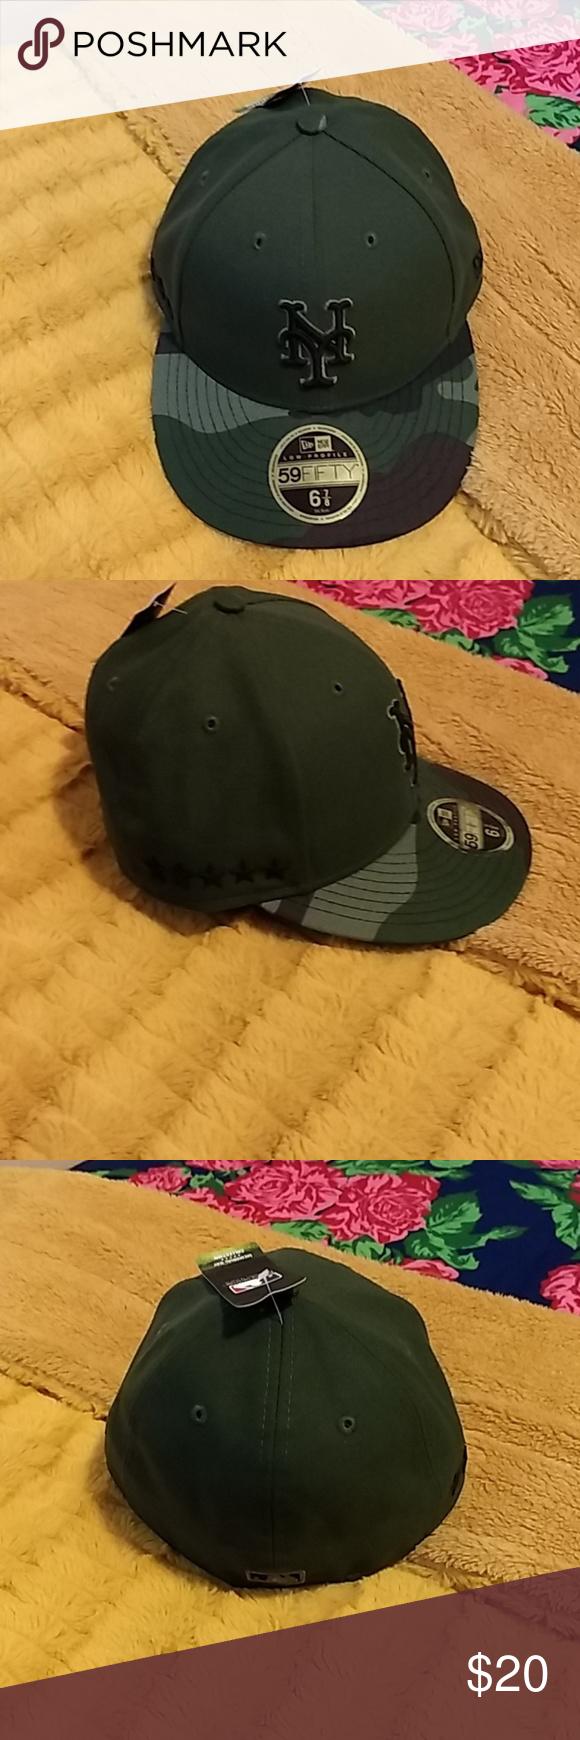 Ny Mets Hat Ny Mets Hats Mets